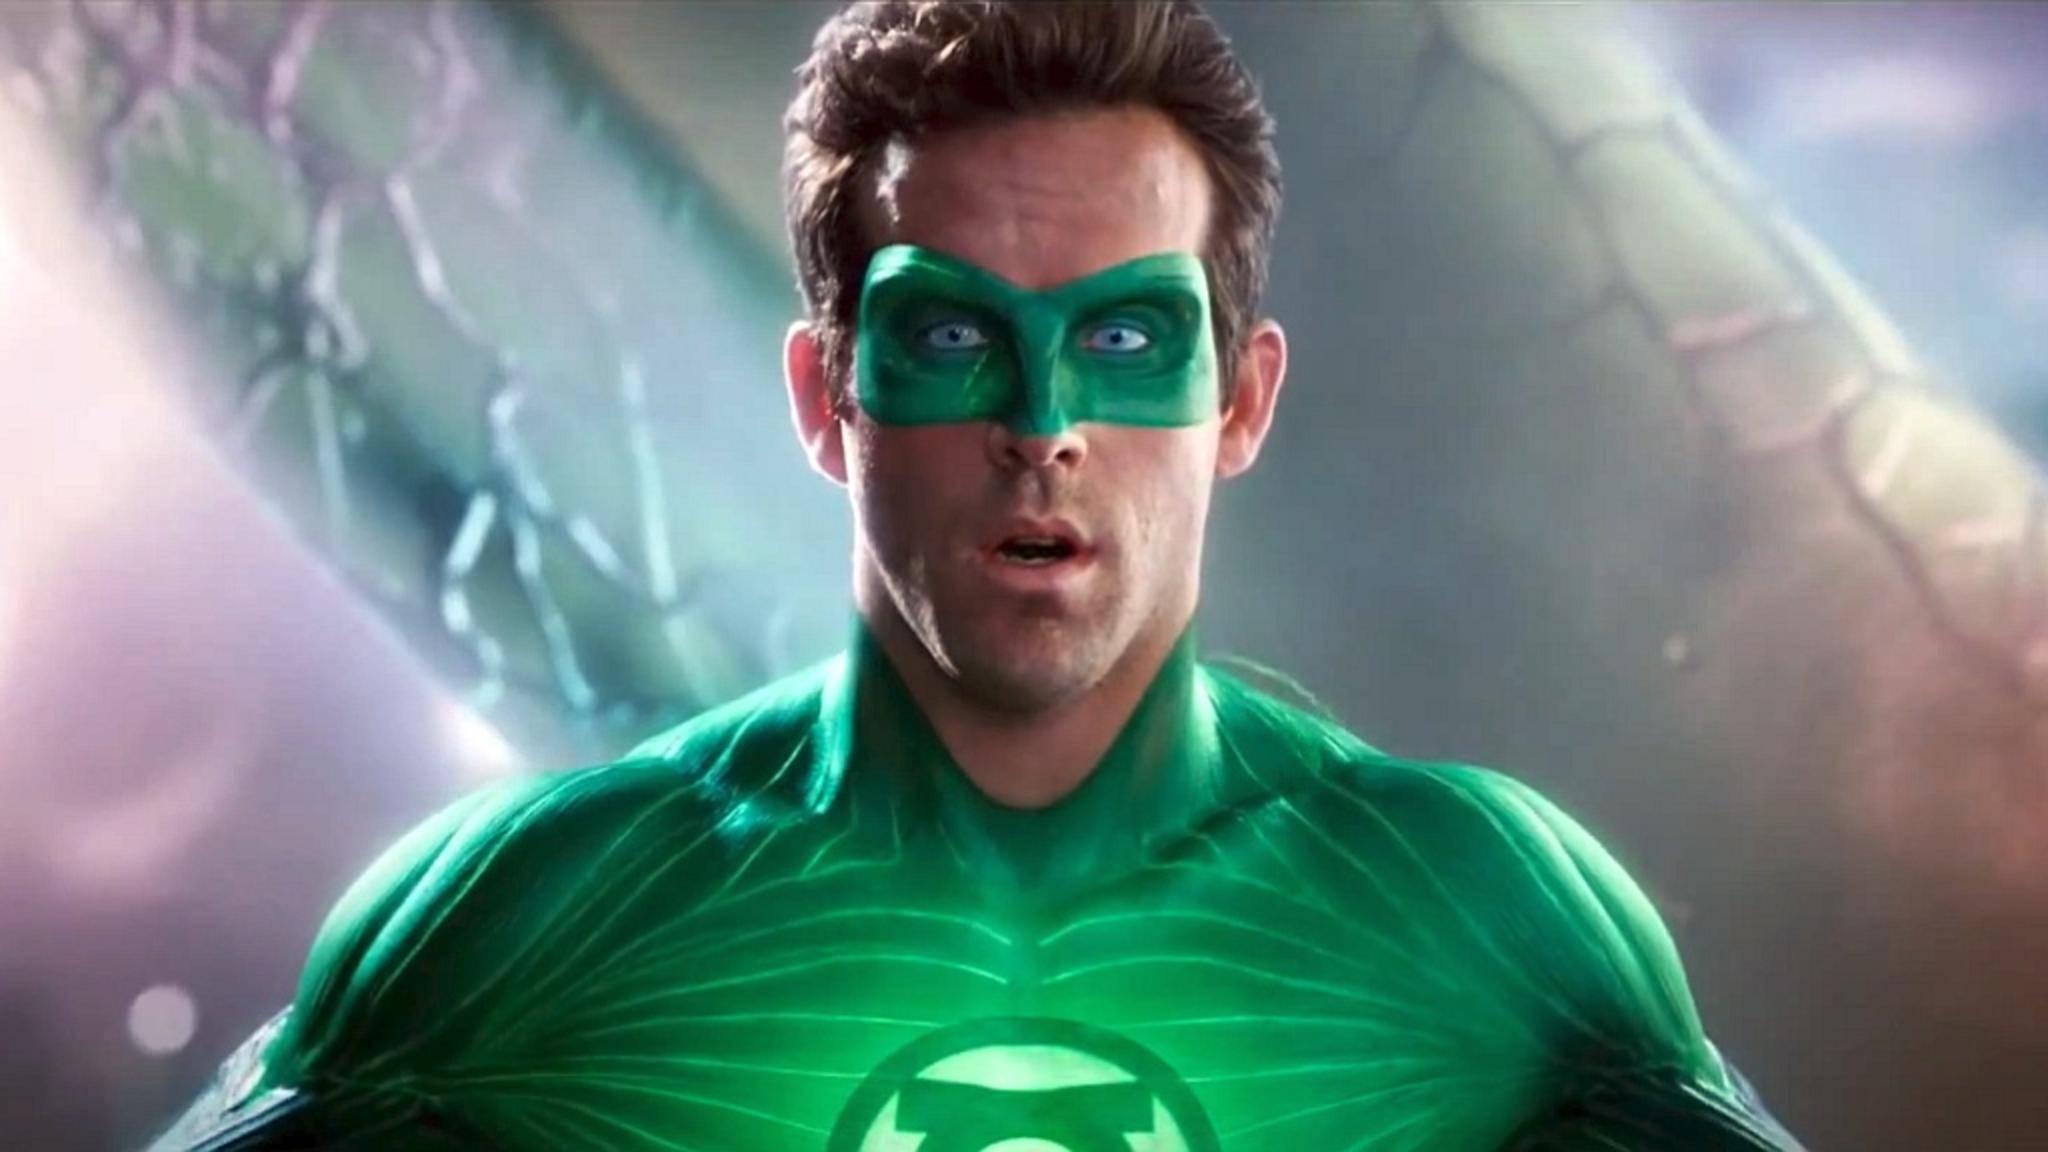 green-lantern-ryan-reynolds-youtube-warnerbrosent